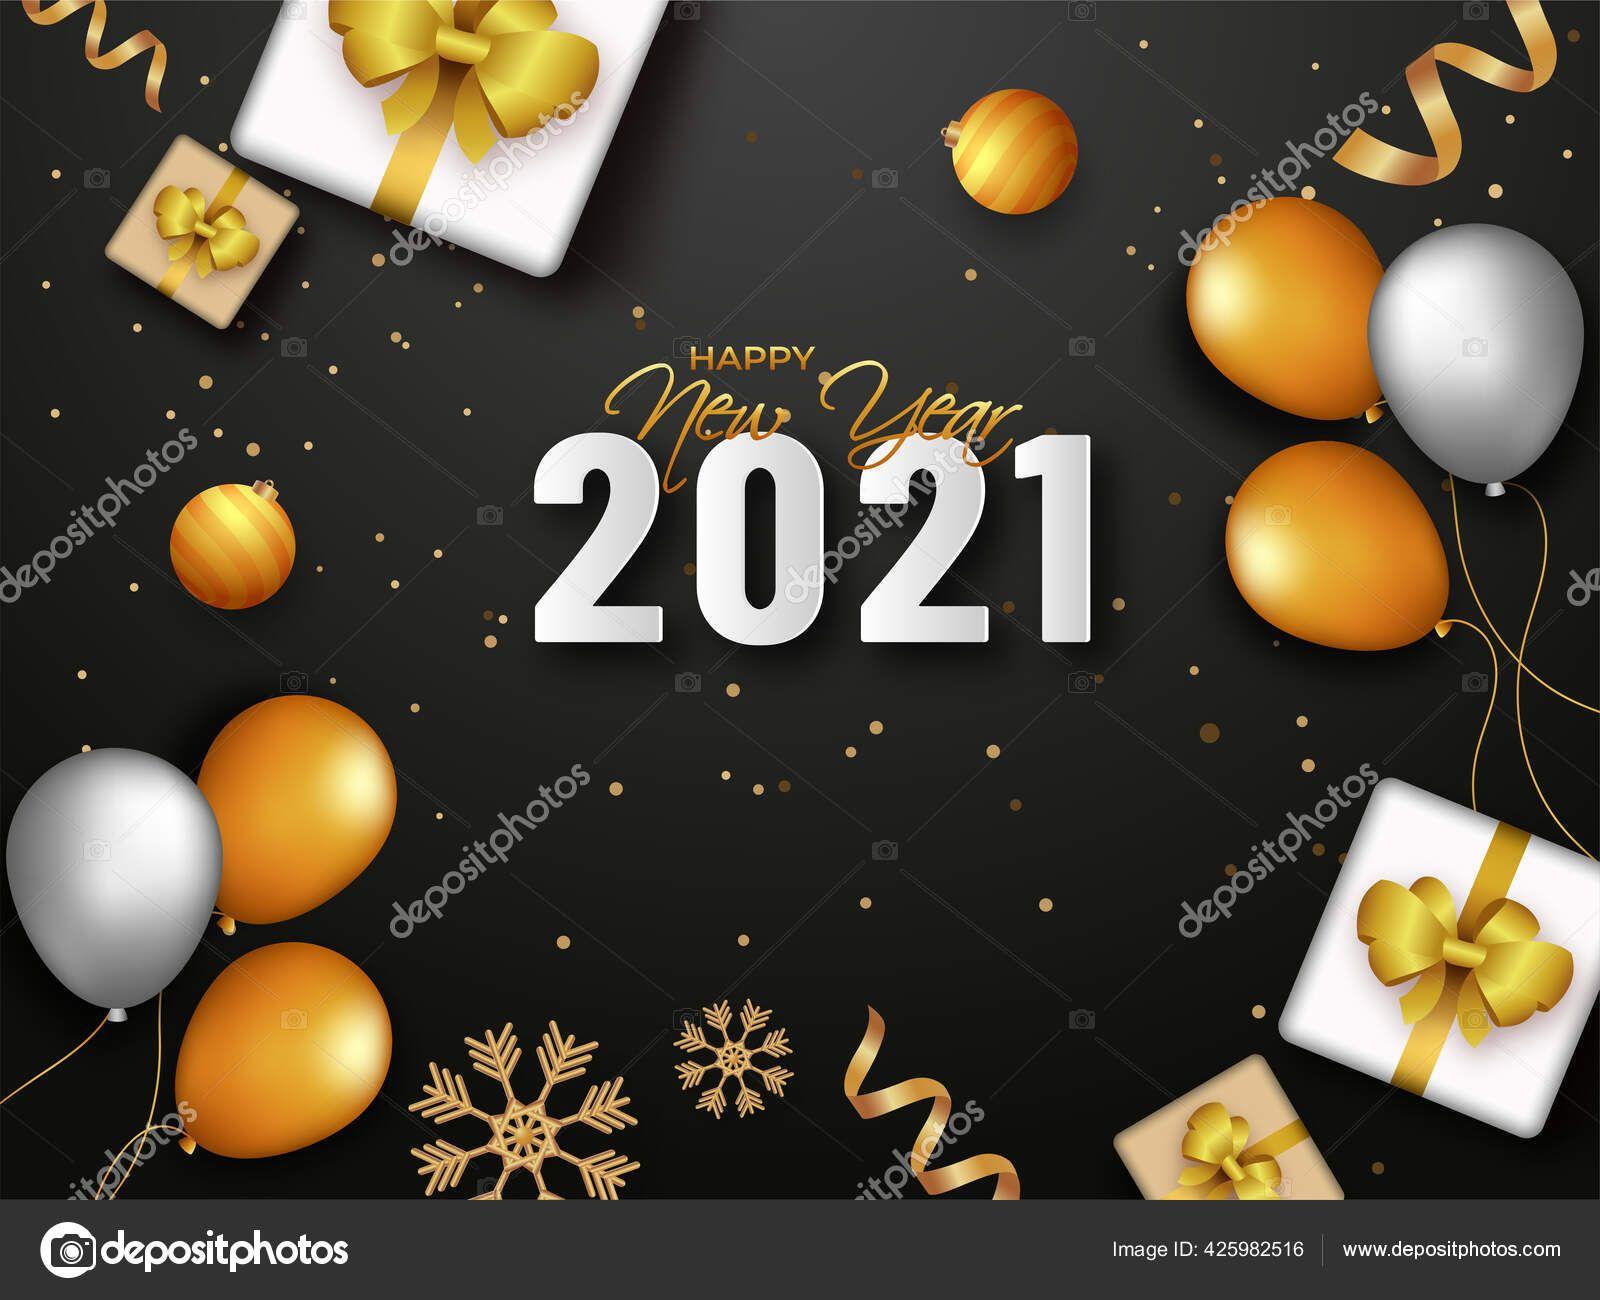 2021 Happy New Year Celebration Balloon Gift Balloons New Year Celebration 2021 new year balloons and gift